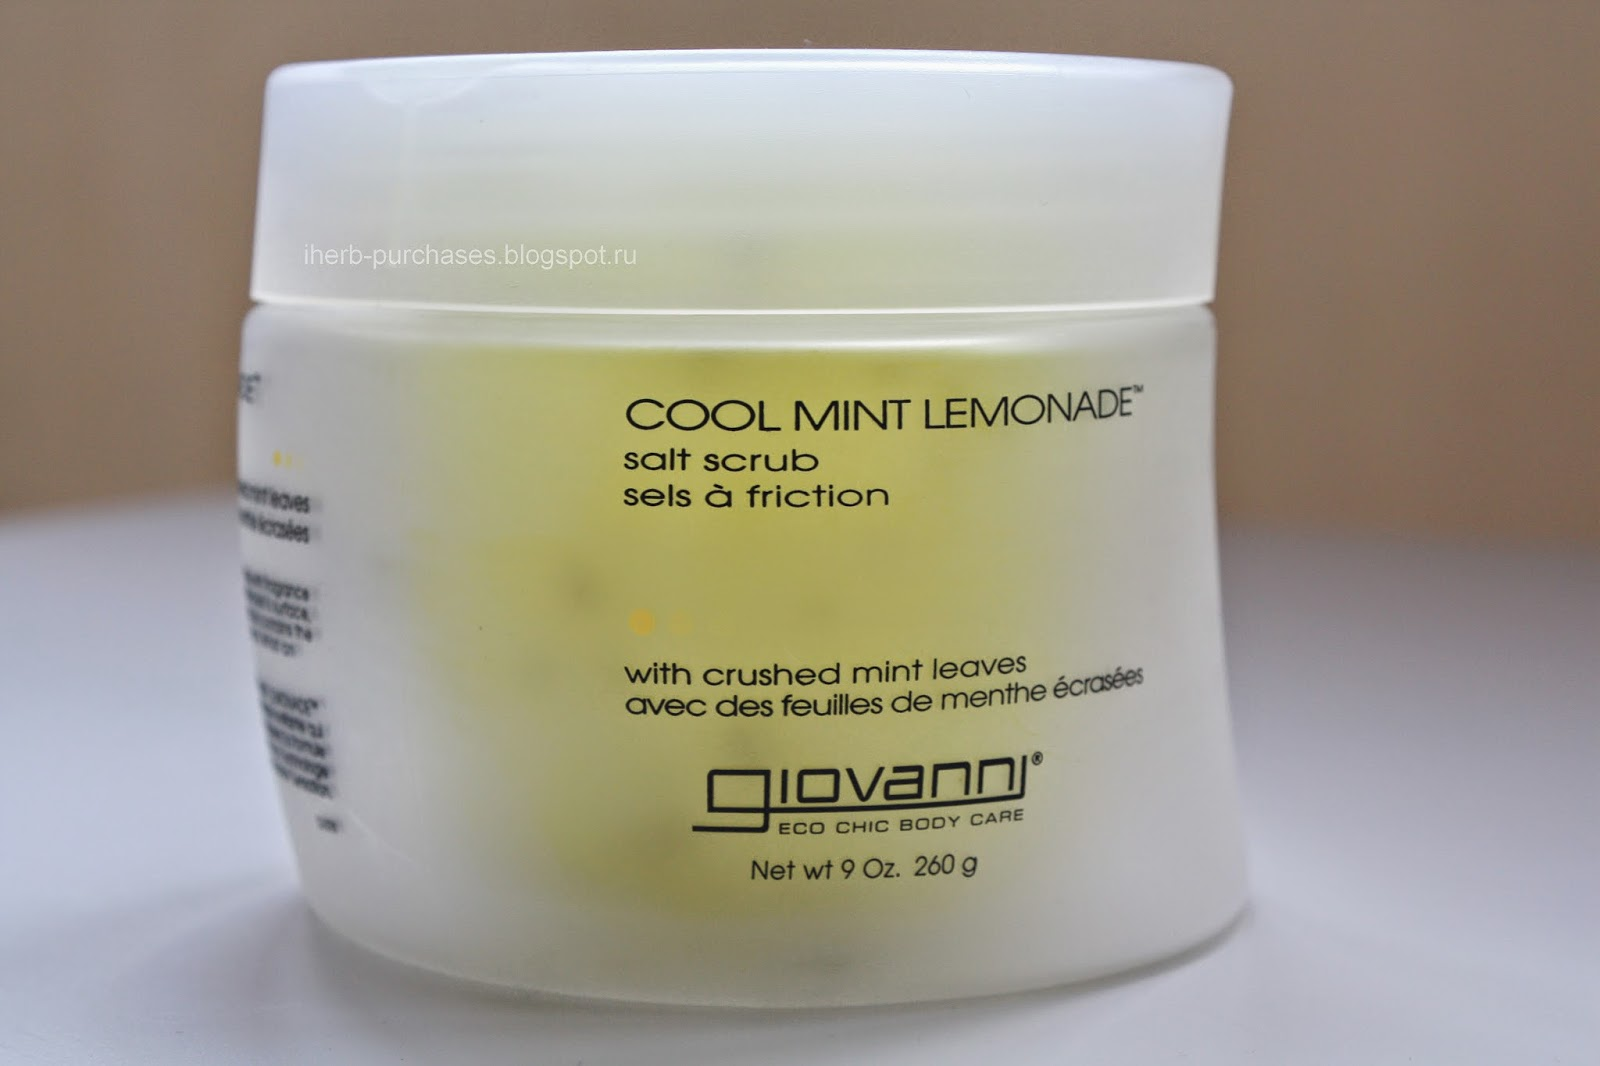 Giovanni, Salt Scrub, Cool Mint Lemonade, 9 oz (260 g)